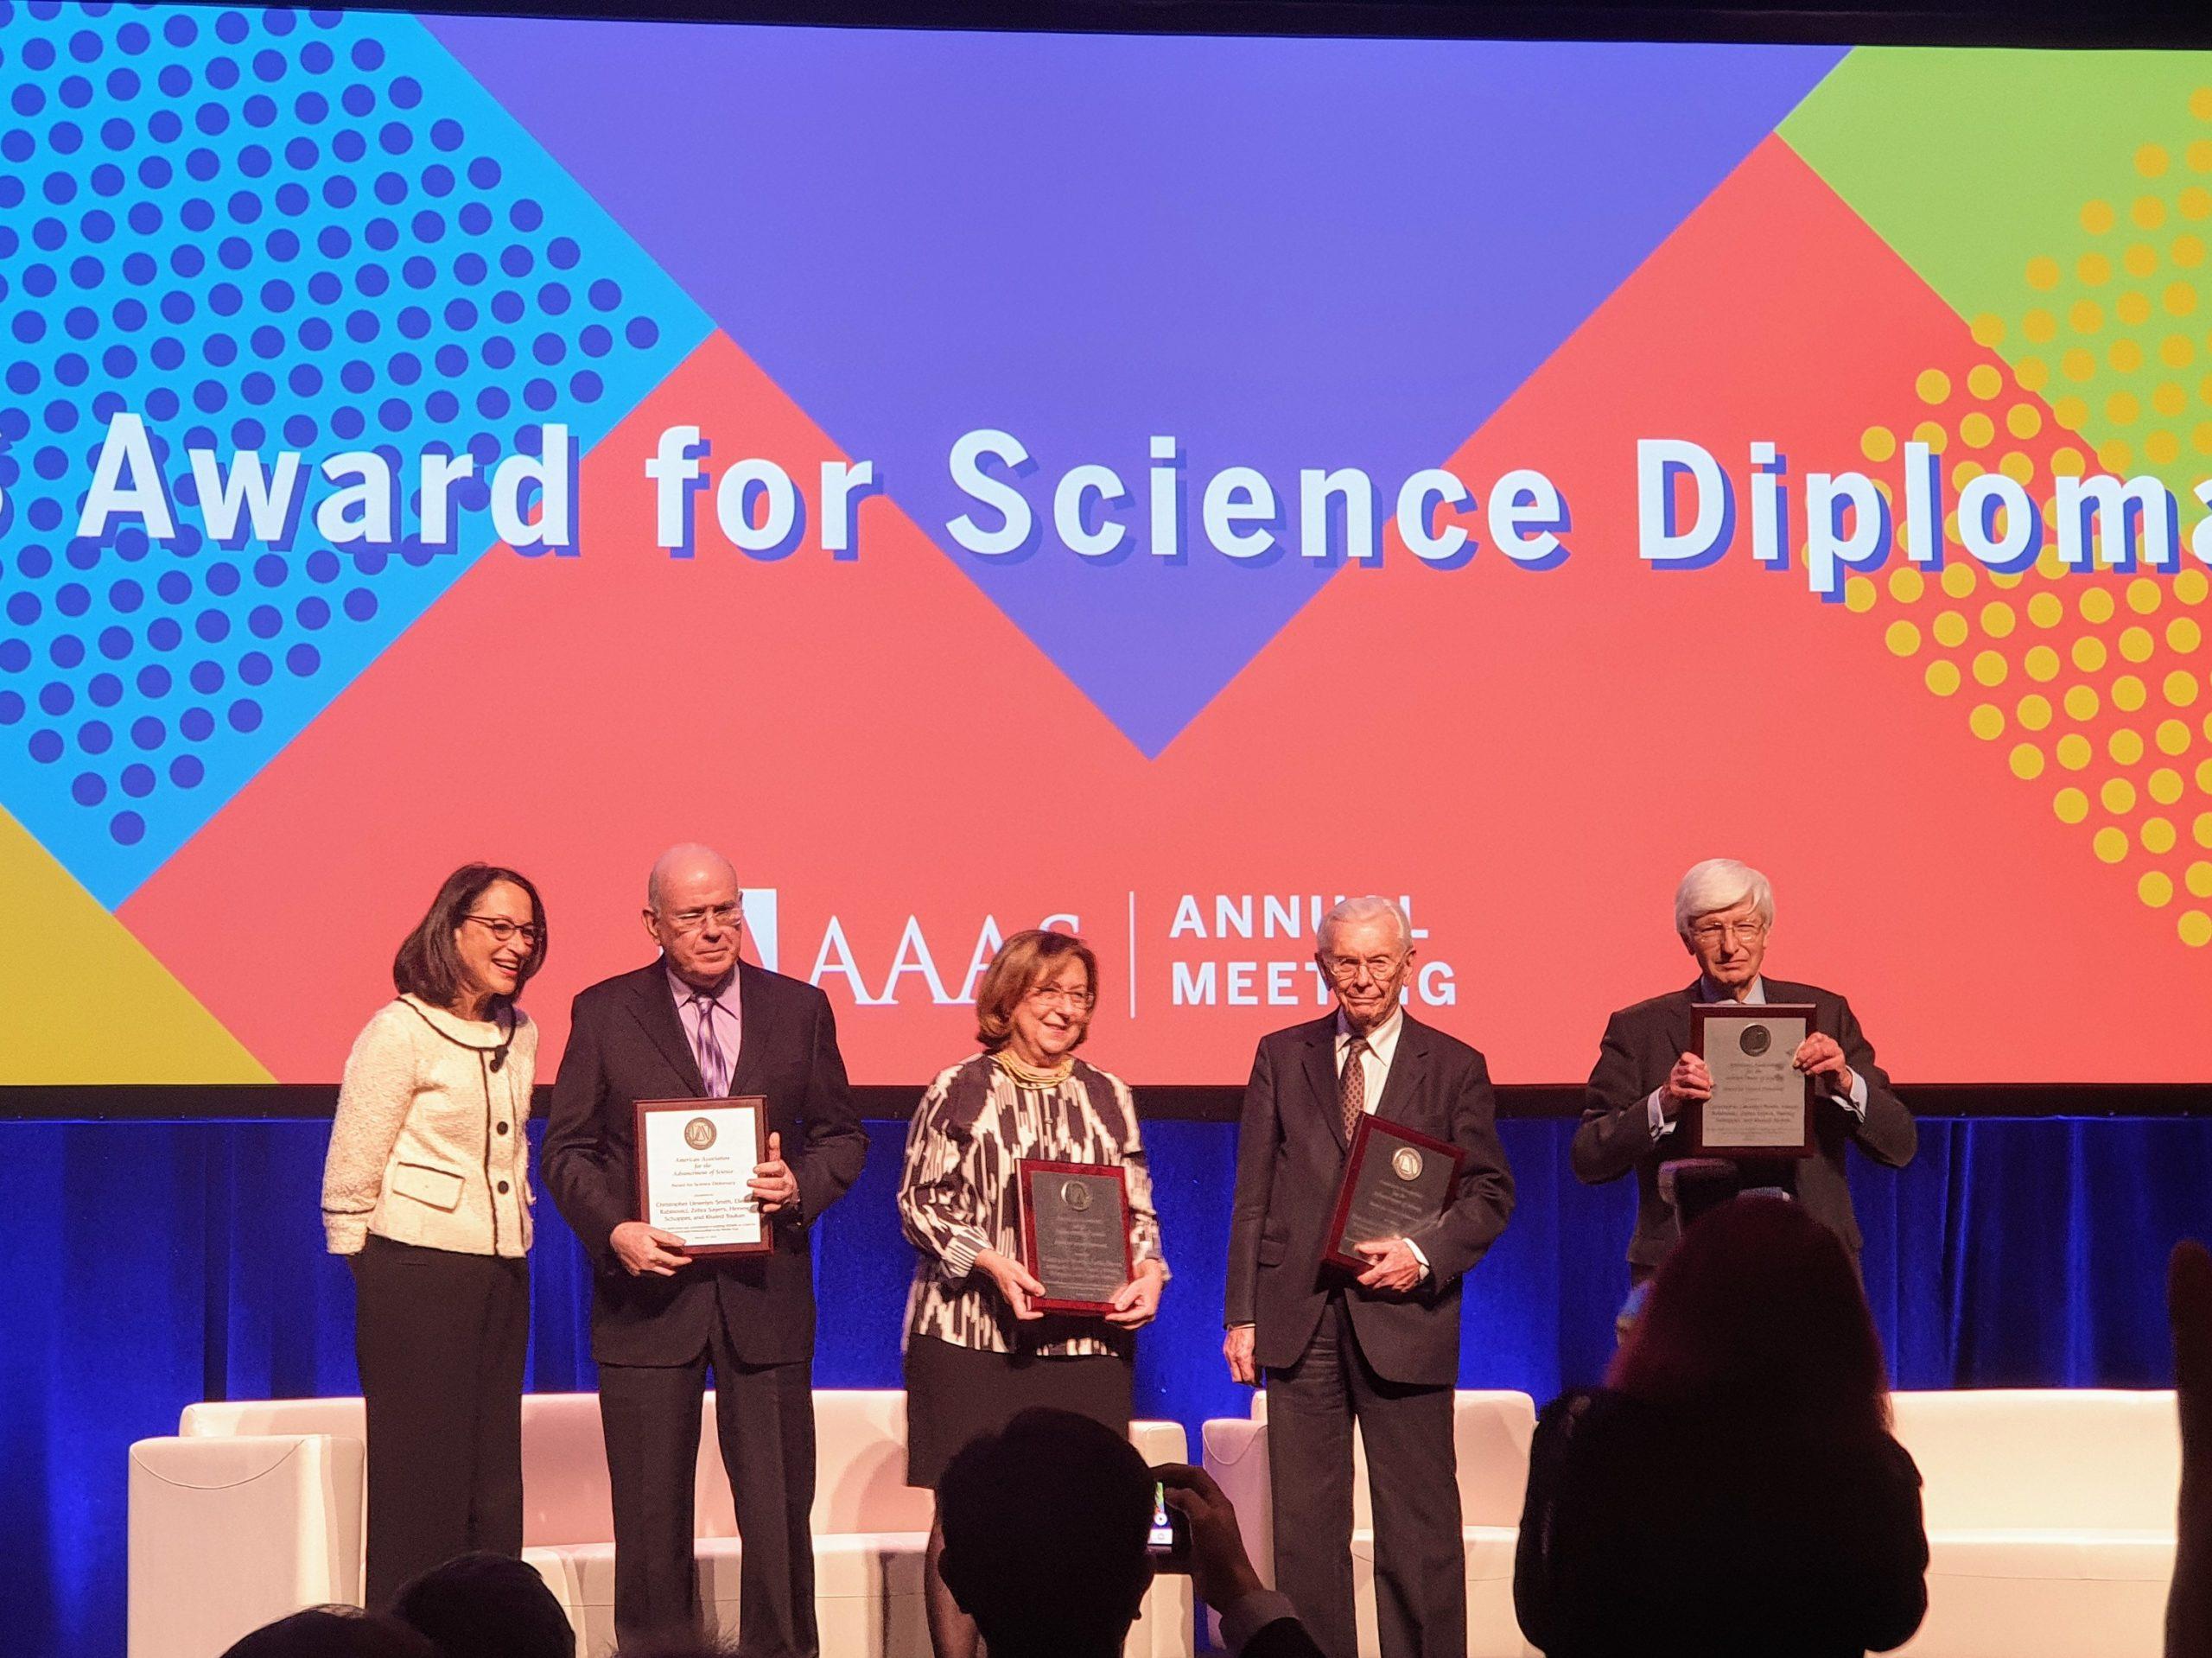 SESAME gets science diplomacy award, goes solar